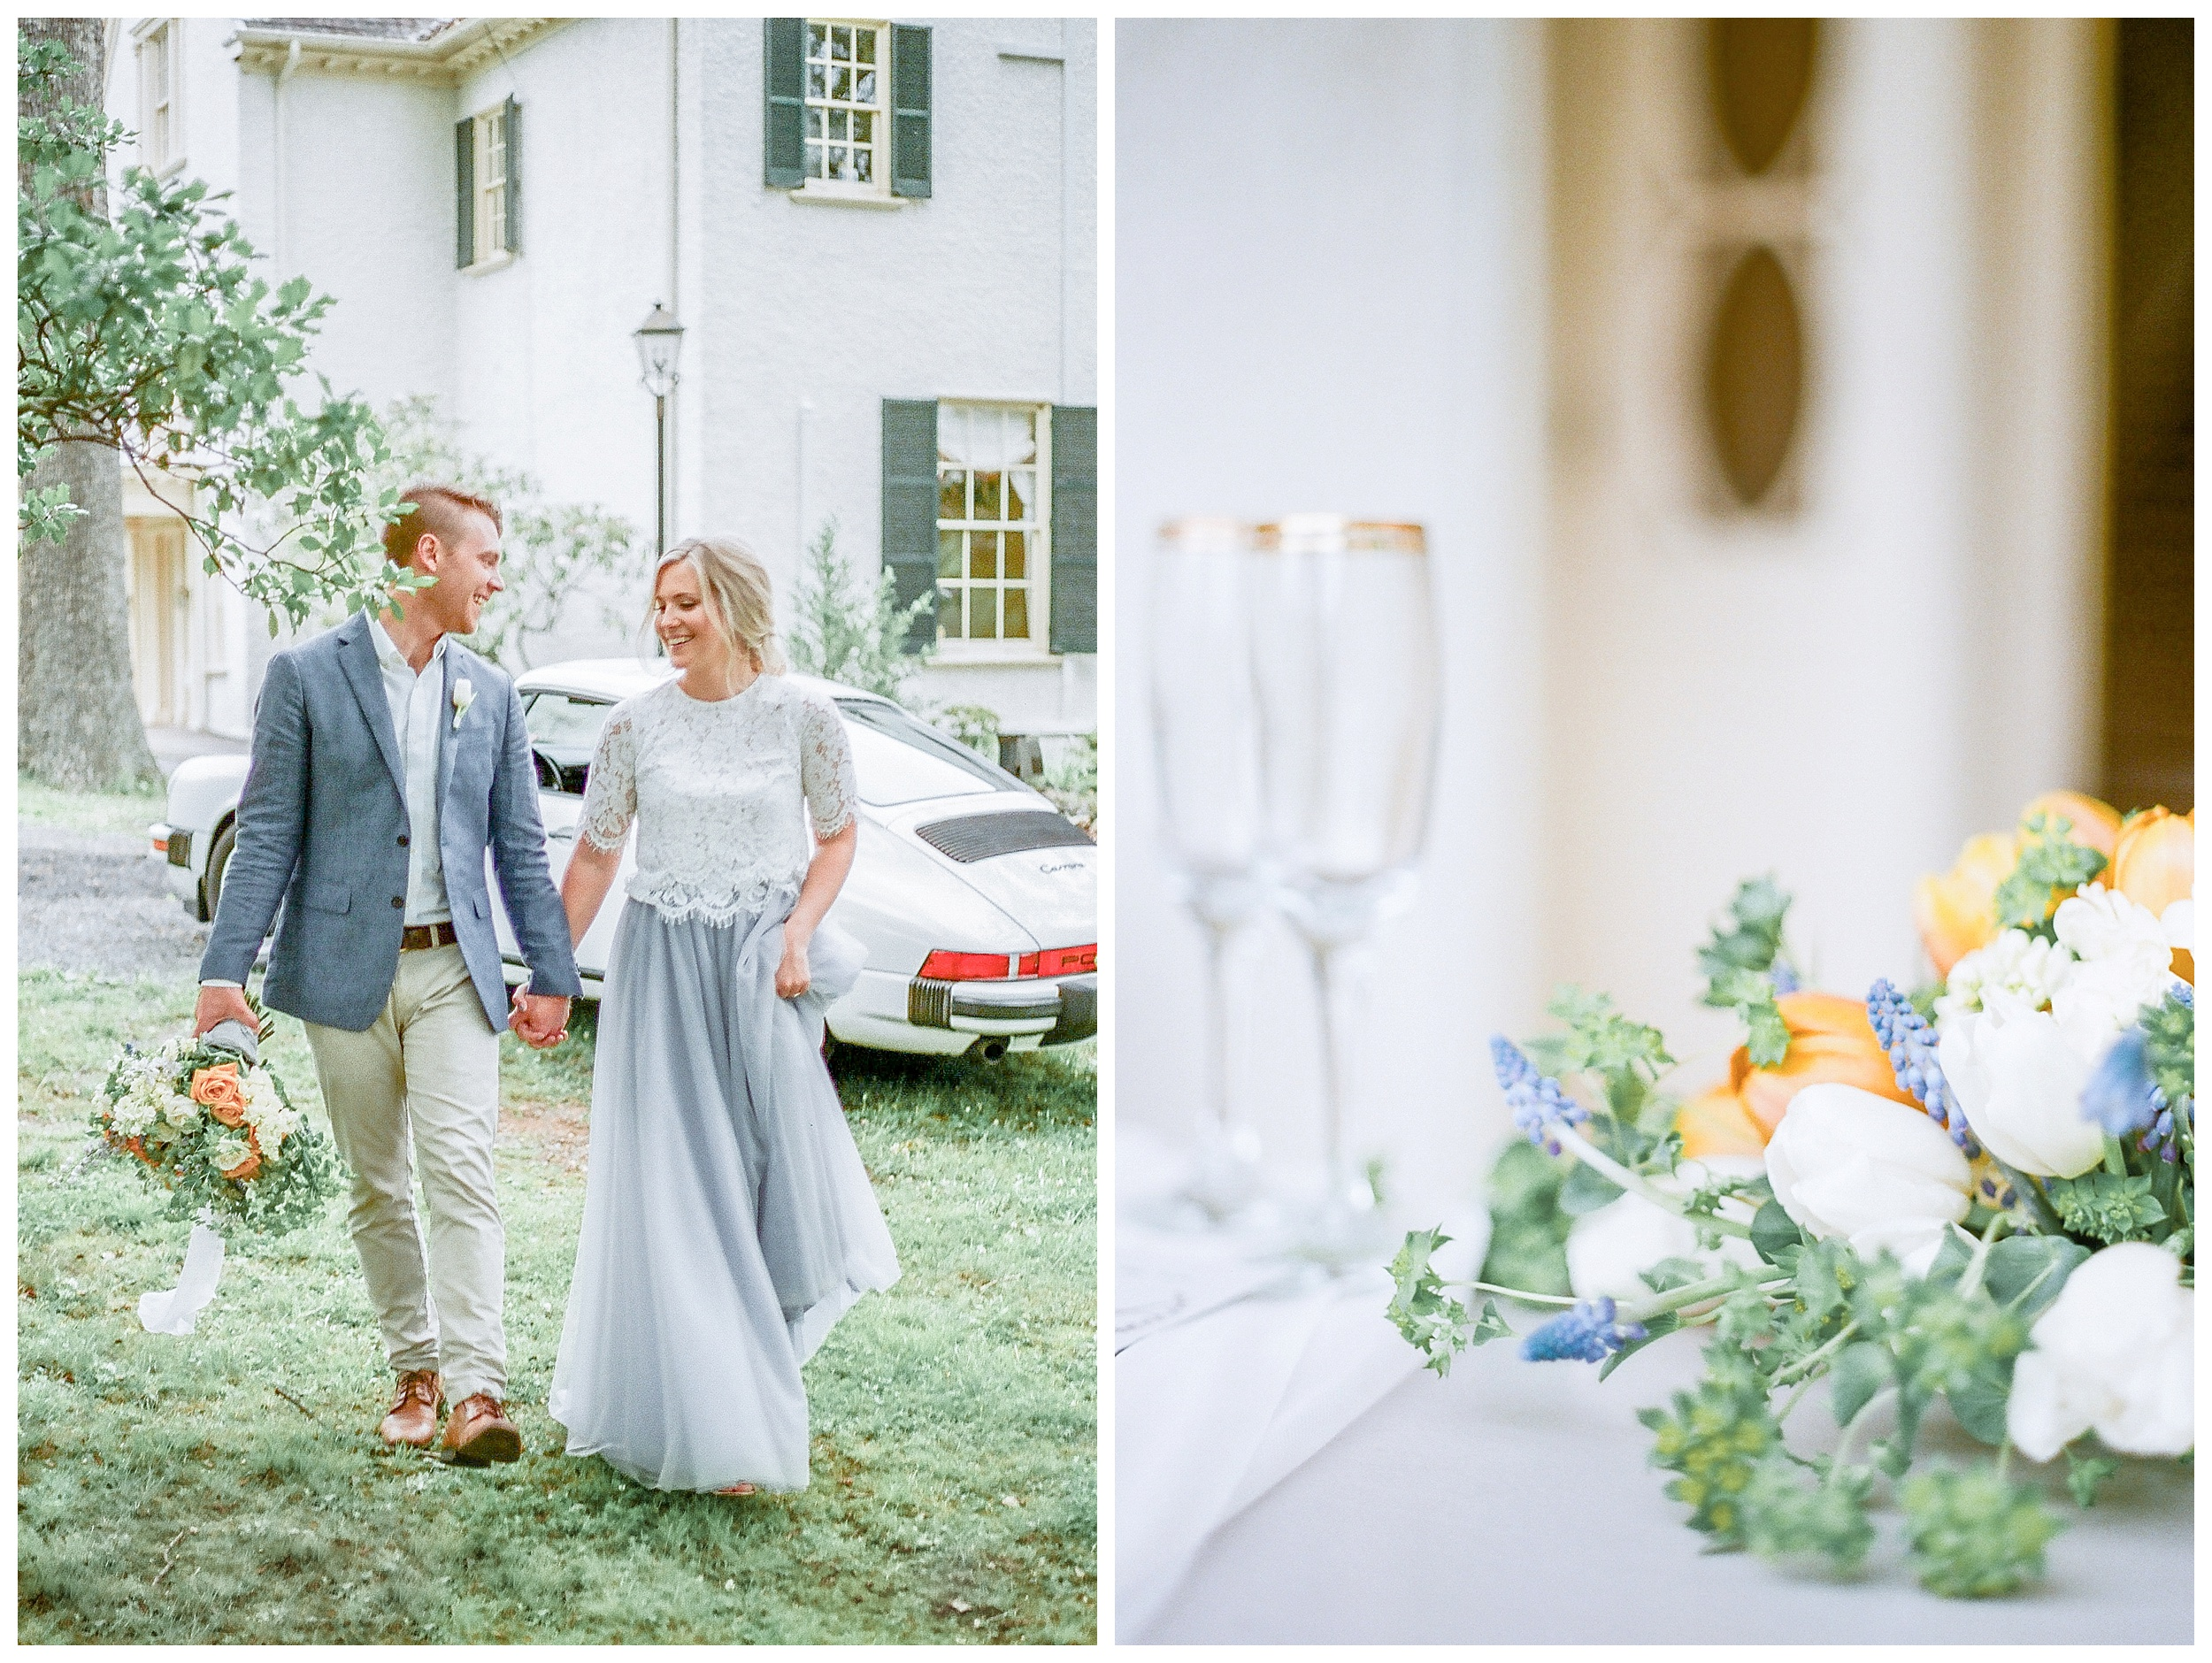 Rust Manor Wedding   Virginia Wedding Photographer Kir Tuben_0023.jpg